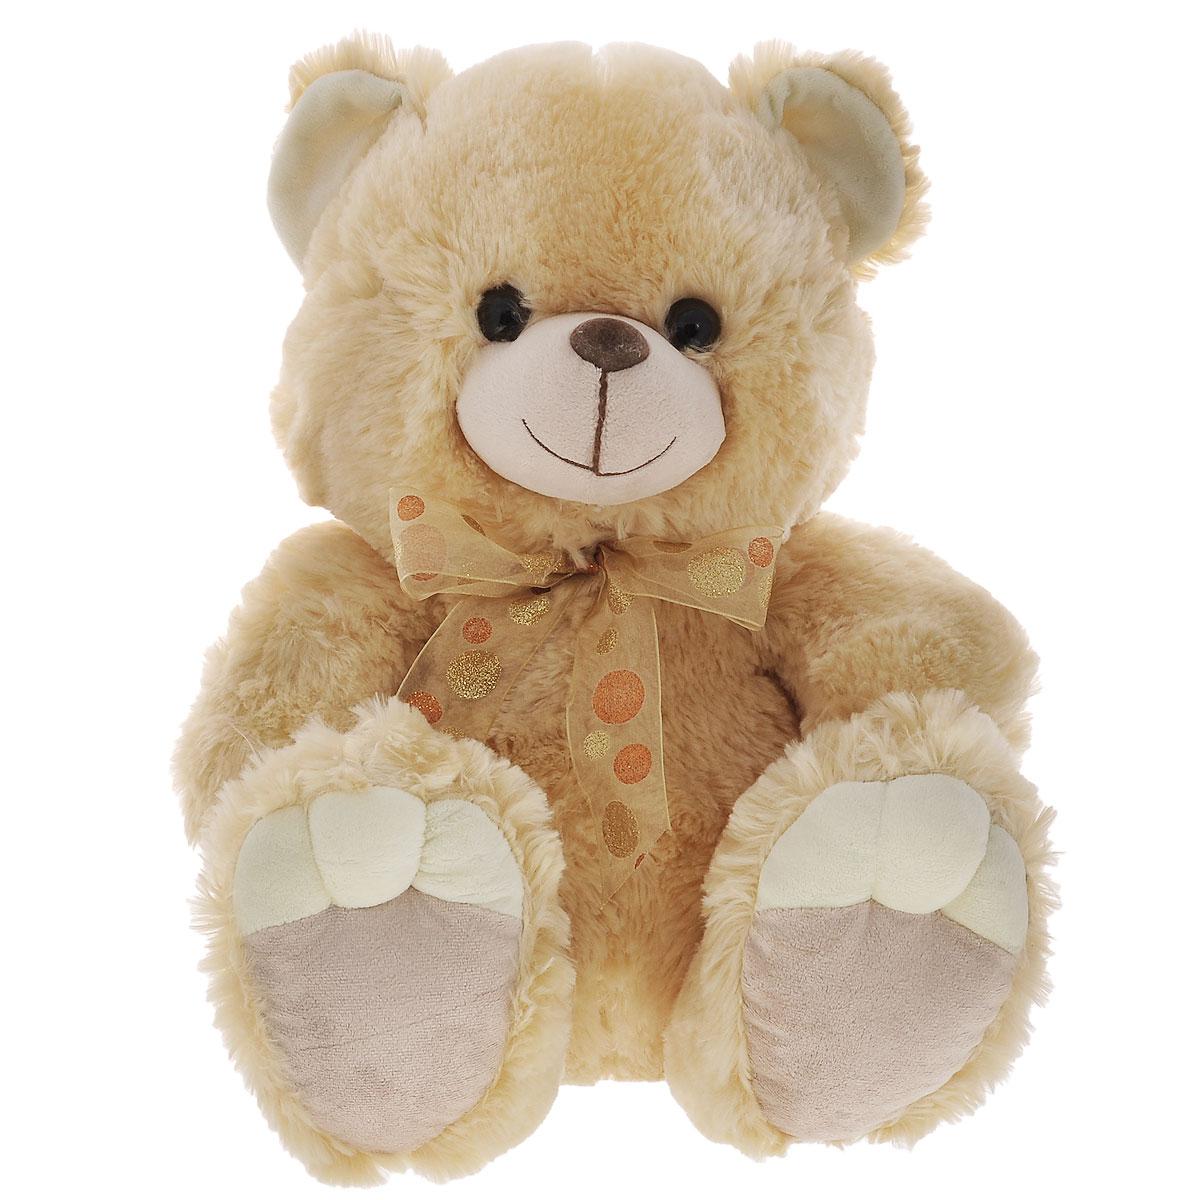 Plush Apple Мягкая игрушка Медведь, 40 см plush apple 27